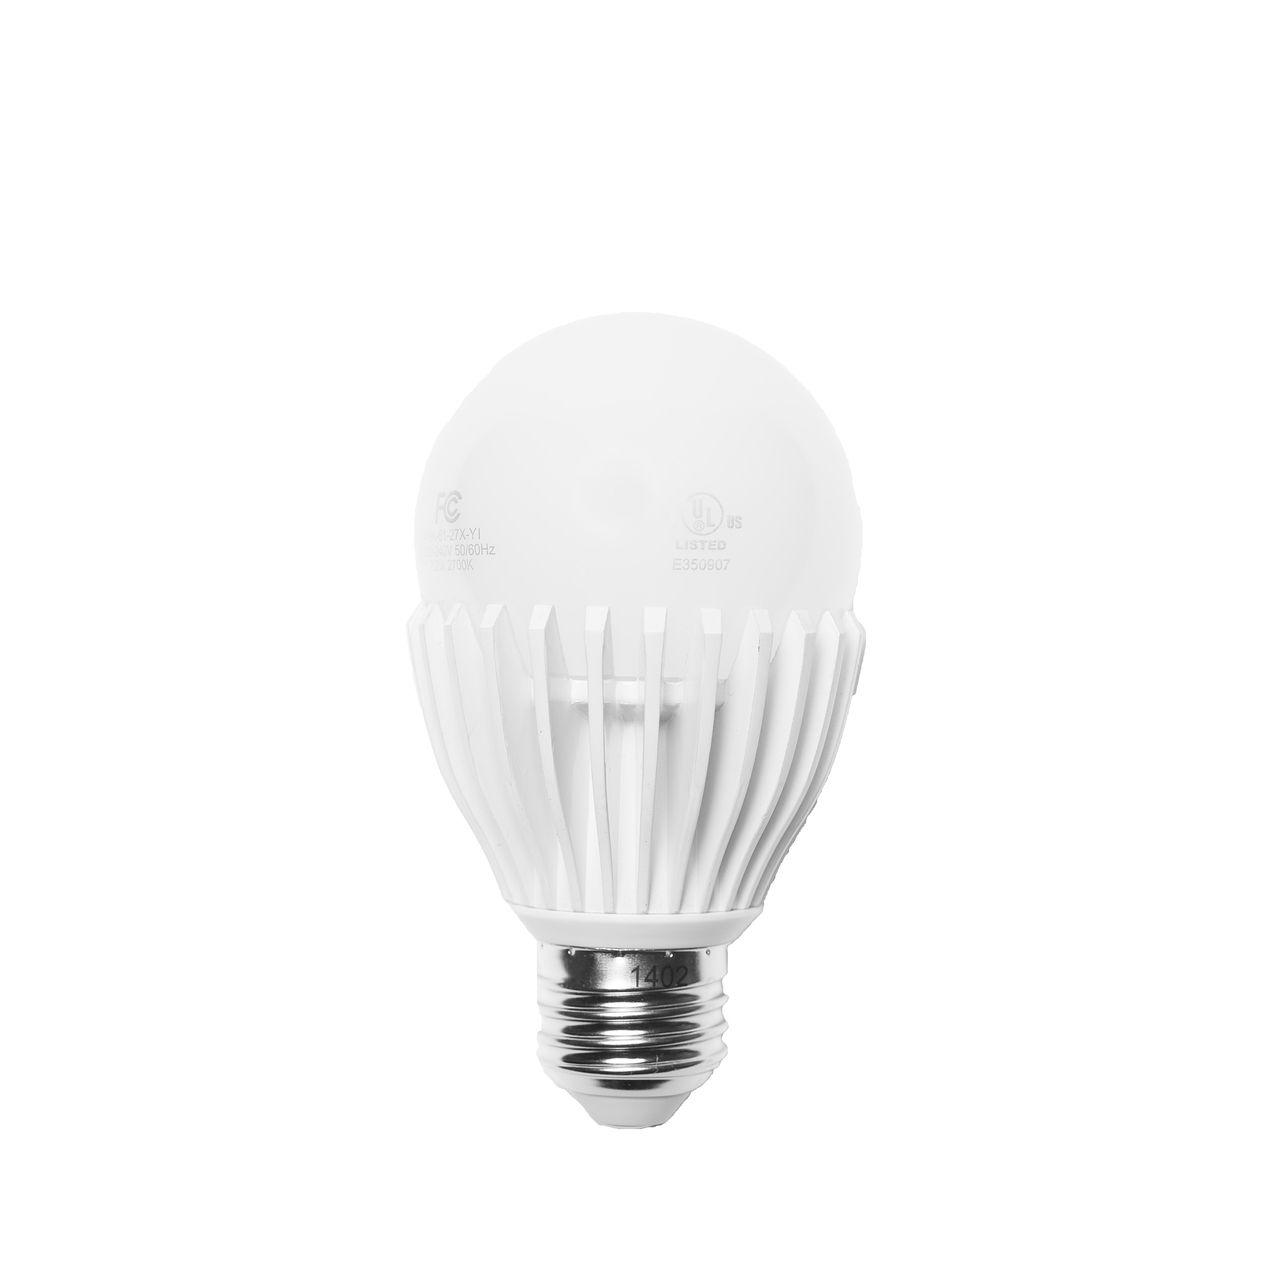 U Save Lighting 7 Watt Led Light Bulb With Images Dimmable Led Led Bulb Bulb